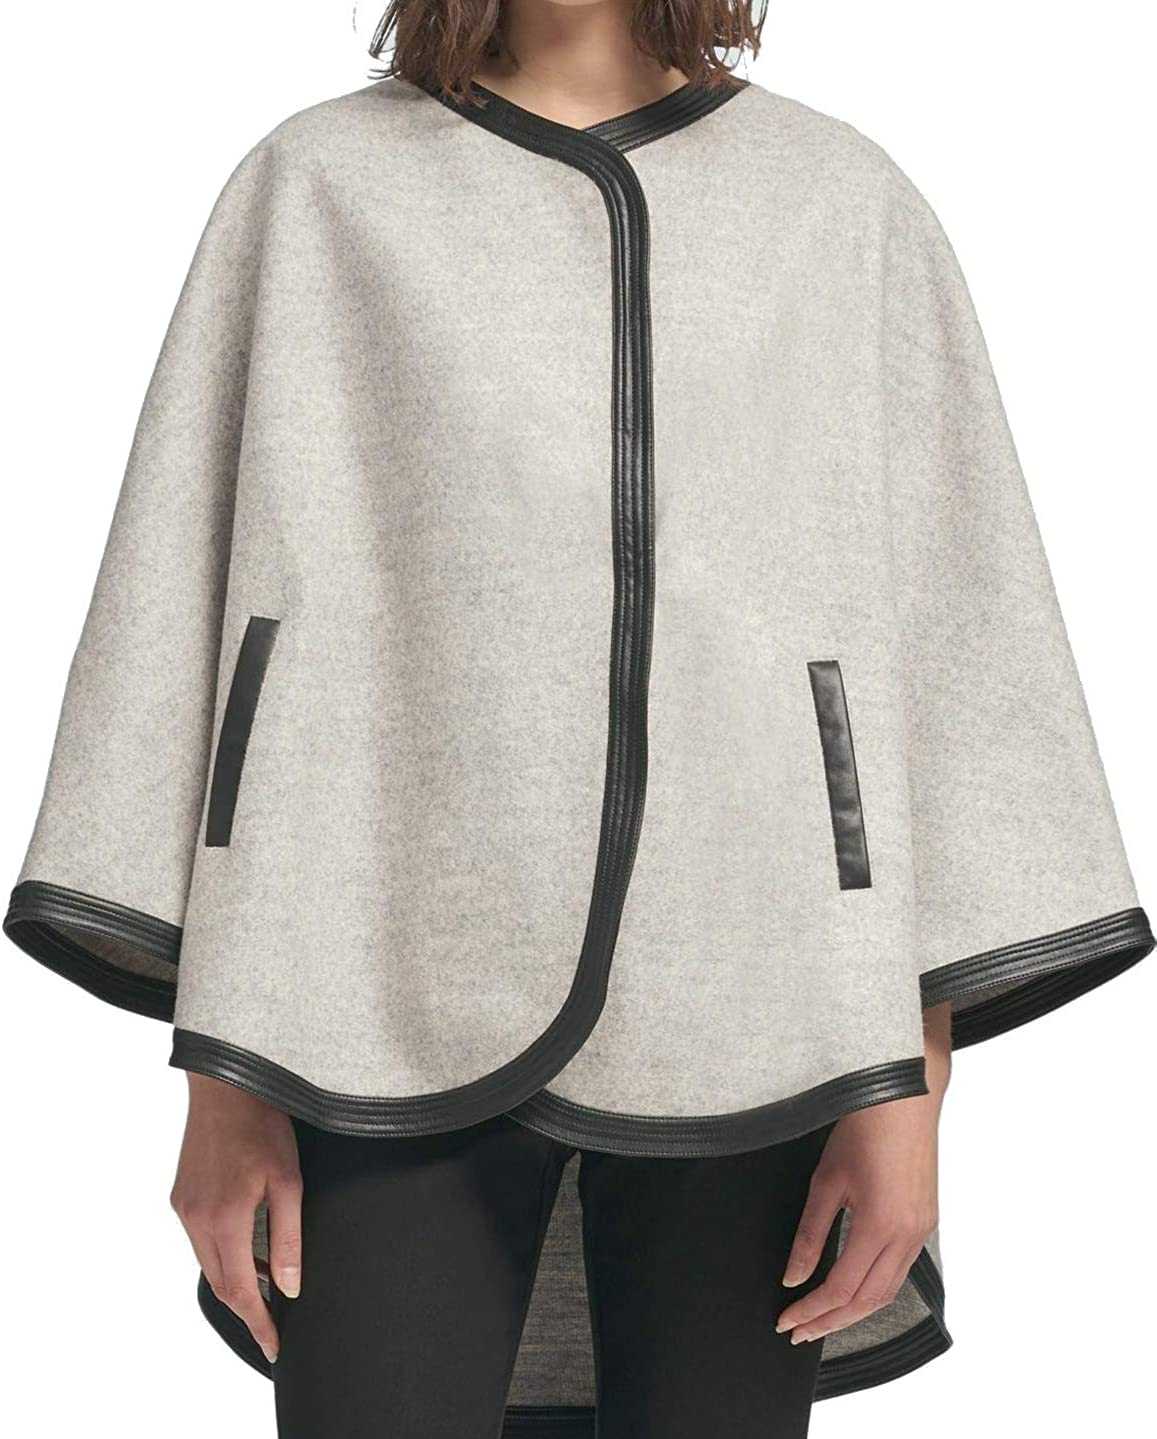 DKNY Womens Faux Leather Trim Poncho Jacket, Grey, Large